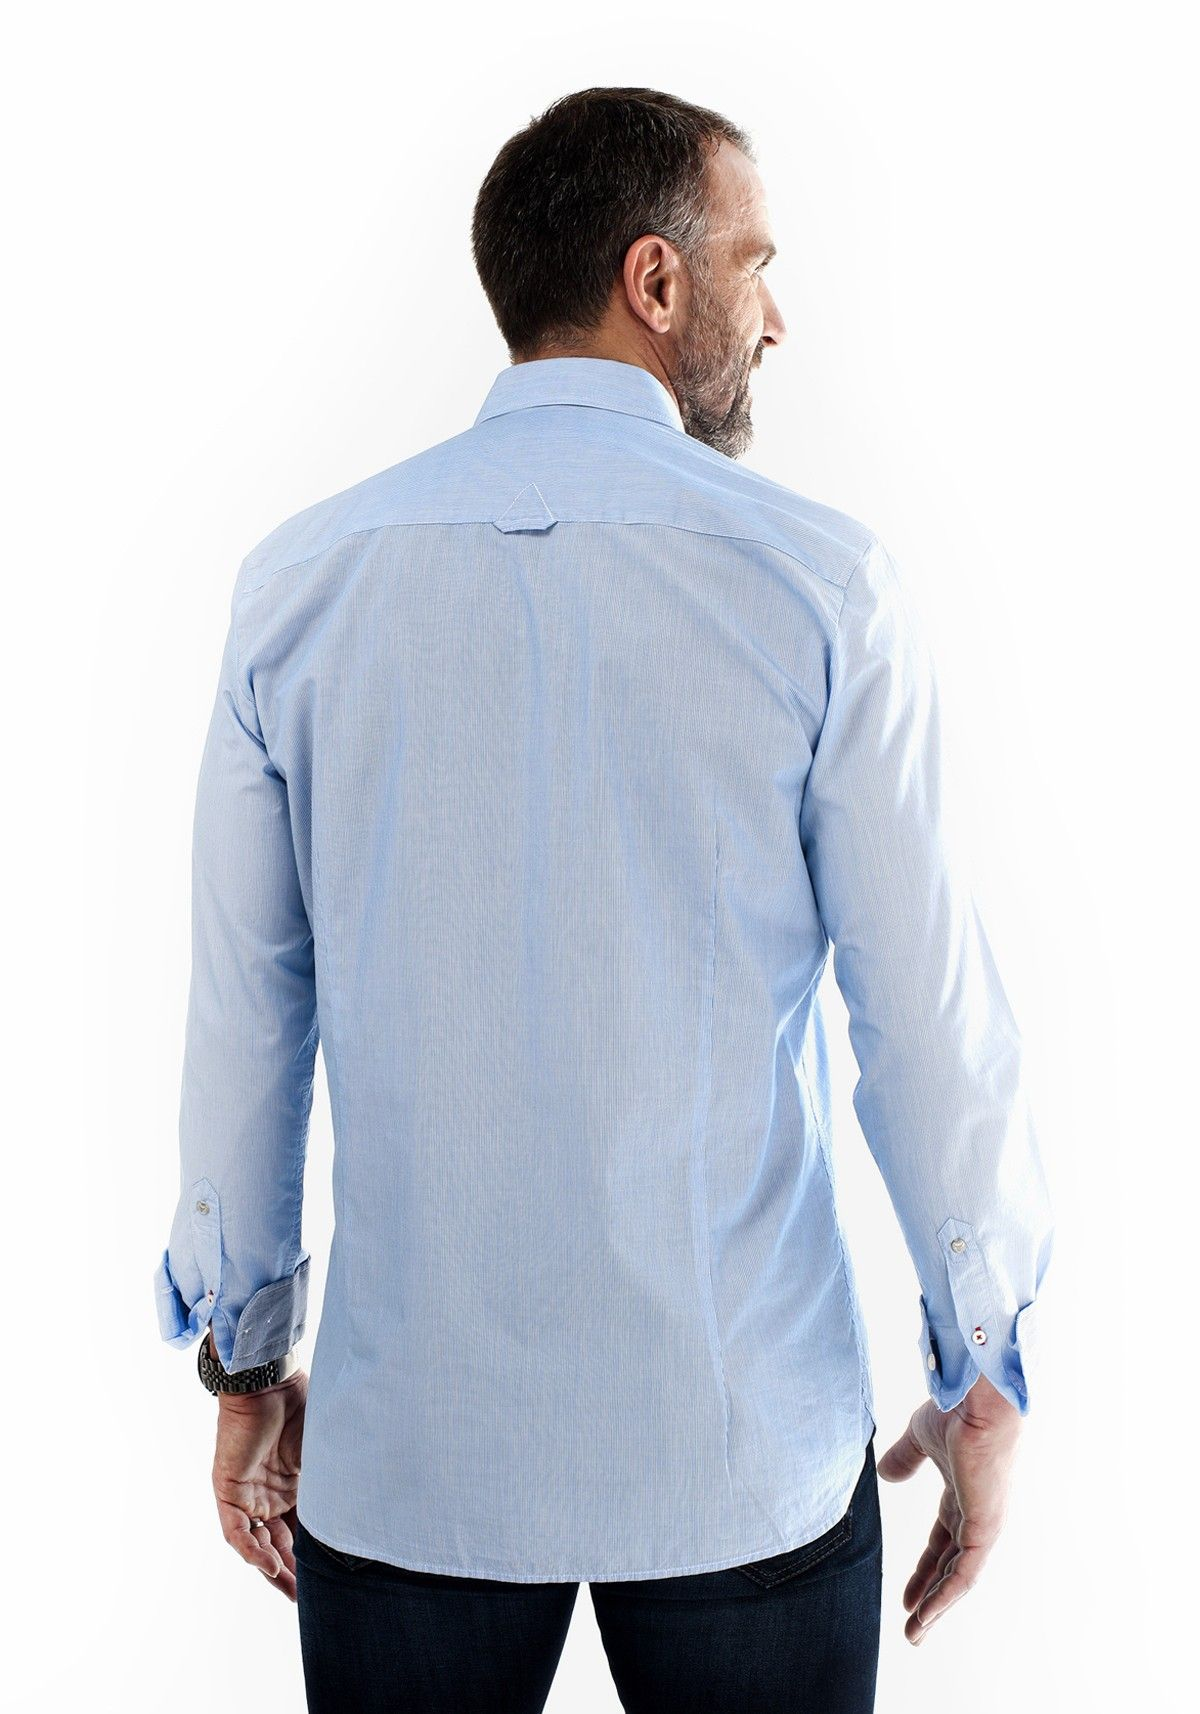 Chemise Bleue Rayures Mode Homme Popeline 100% coton. Style : Rayée